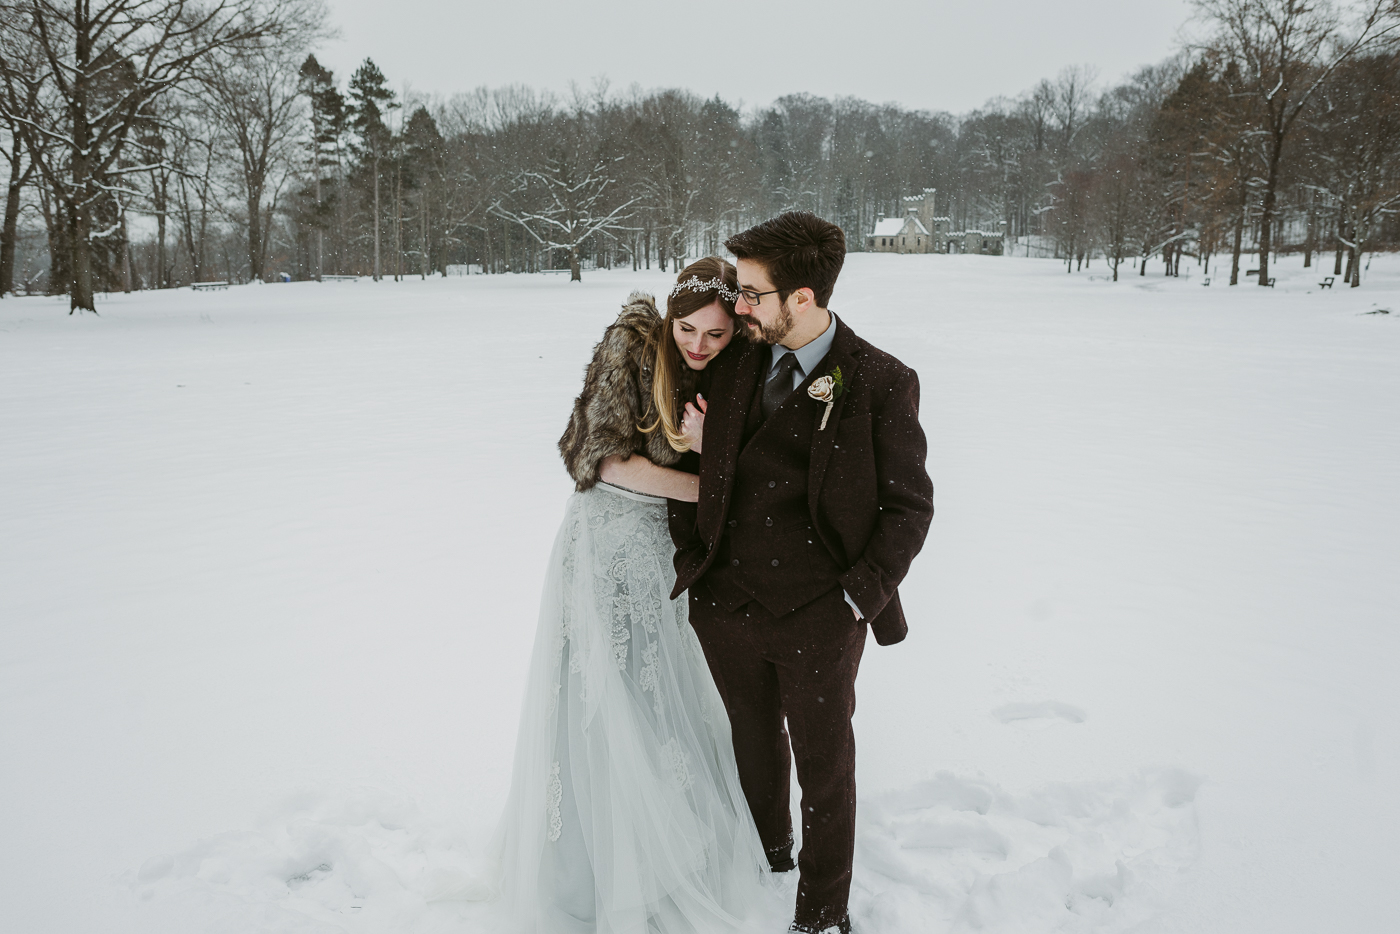 Squires-Castle-Winter-Wedding-4.jpg